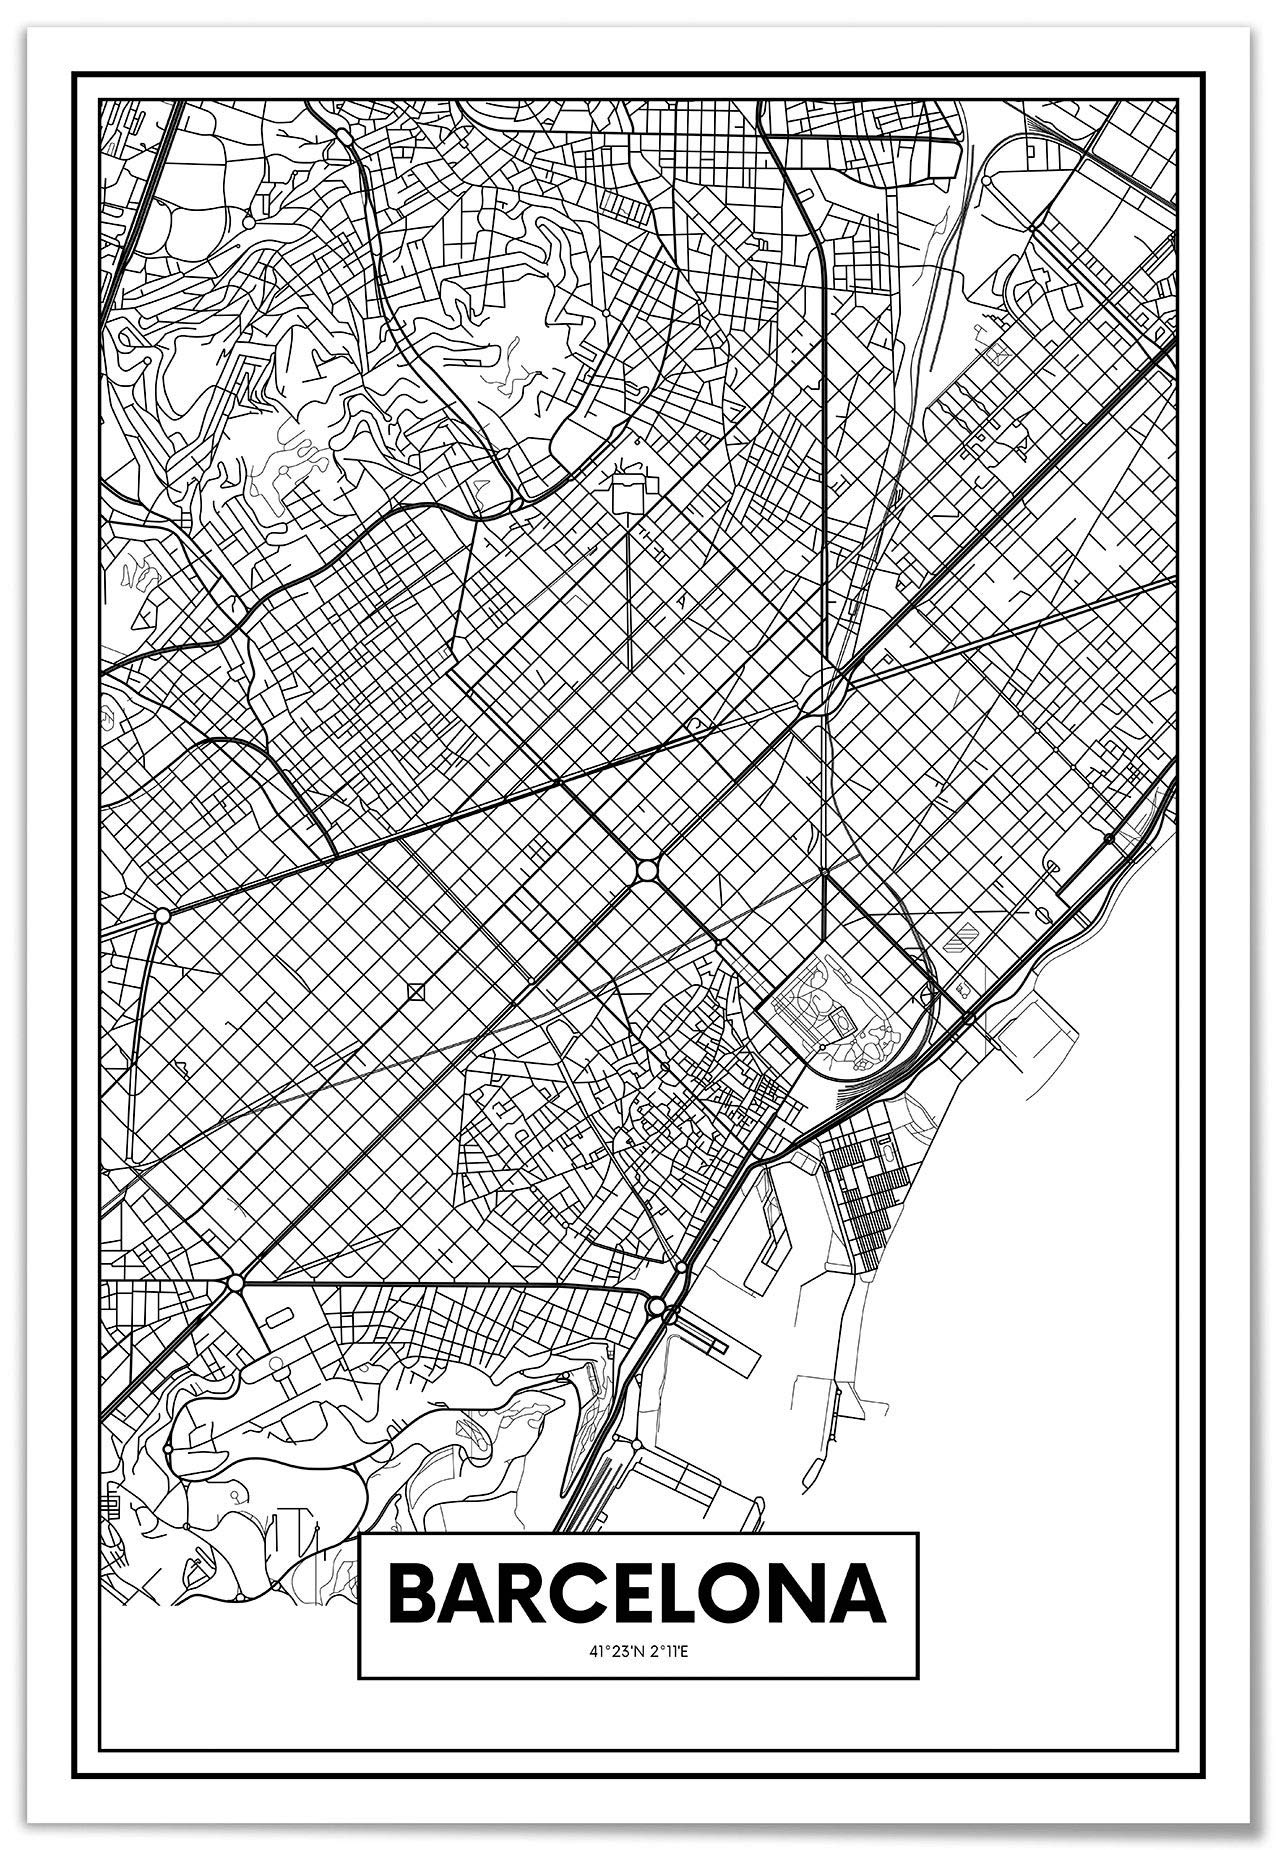 Panorama Lienzo Mapa de Barcelona 50x70cm - Impreso en Lienzo Bastidor - Cuadros Modernos Decoración Salón - Cuadros para Dormitorio - Cuadros Lienzos Decorativos: Amazon.es: Hogar